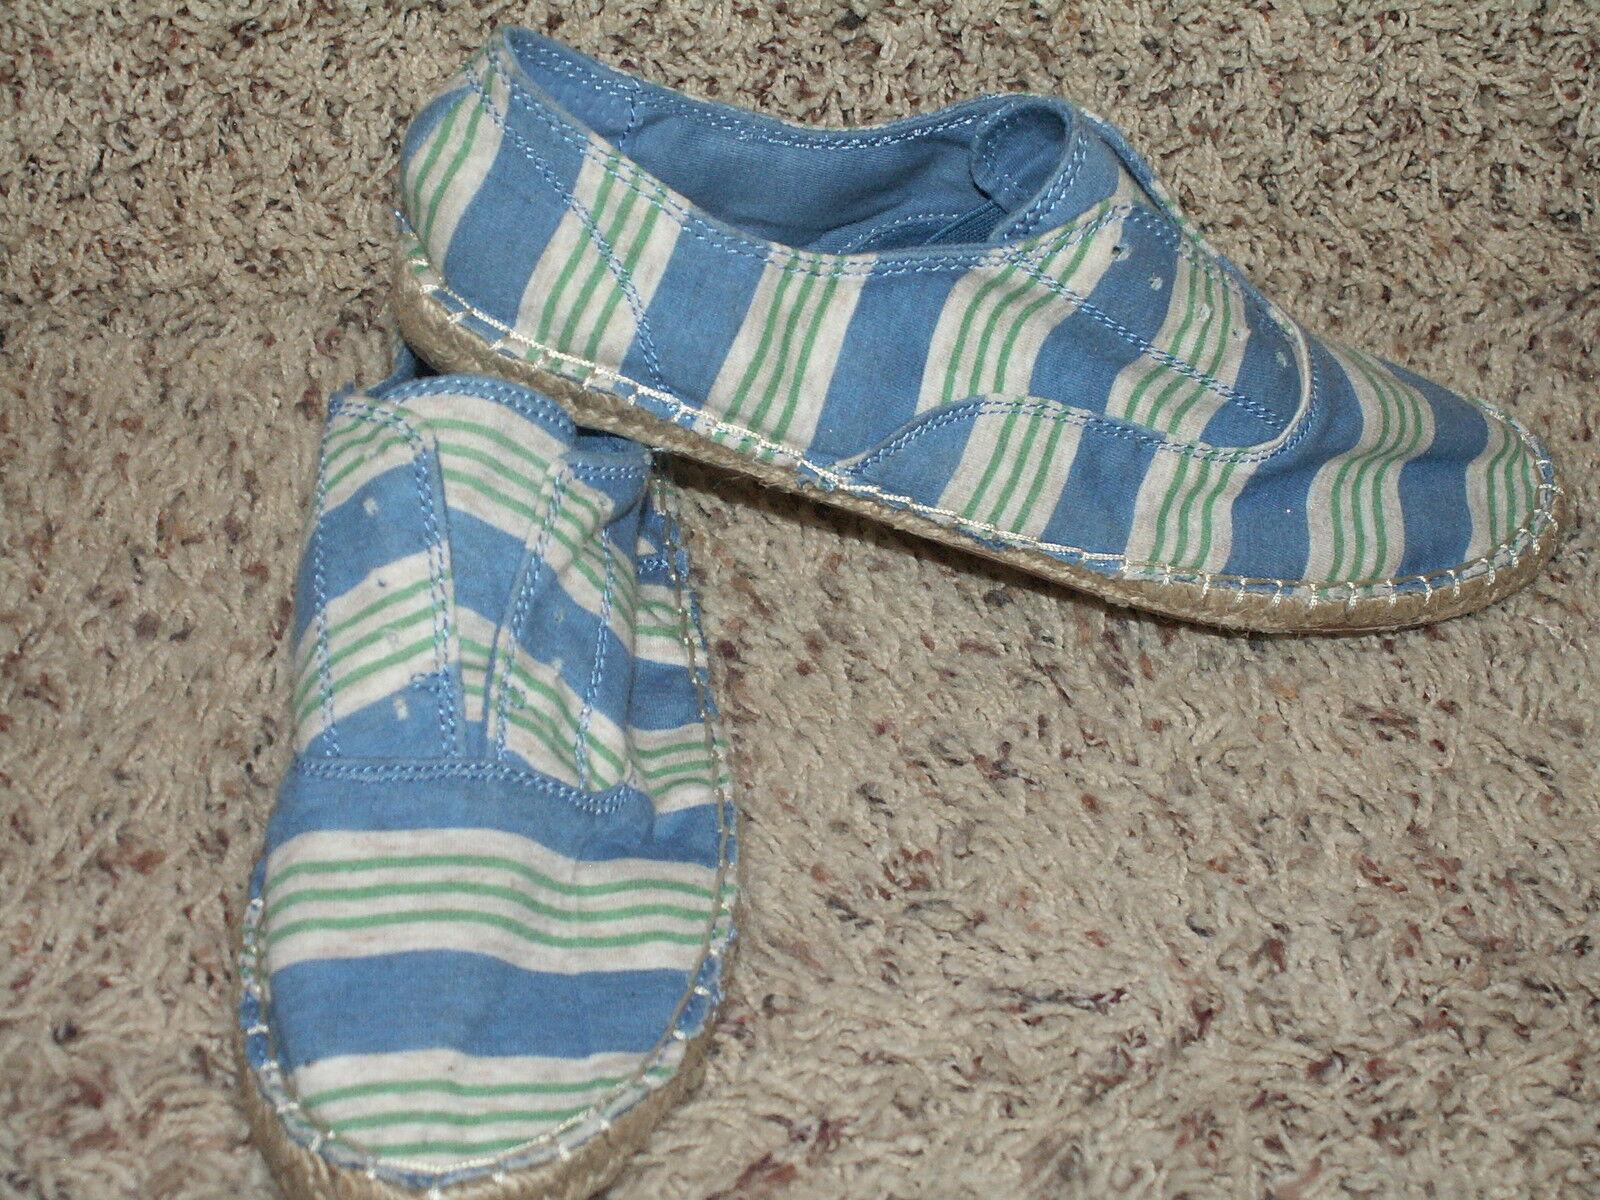 SPLENDID BLUE & GREEN STRIPE SLIP ON FLATS WOMENS SHOES SIZE 5.5 NEW NWOB